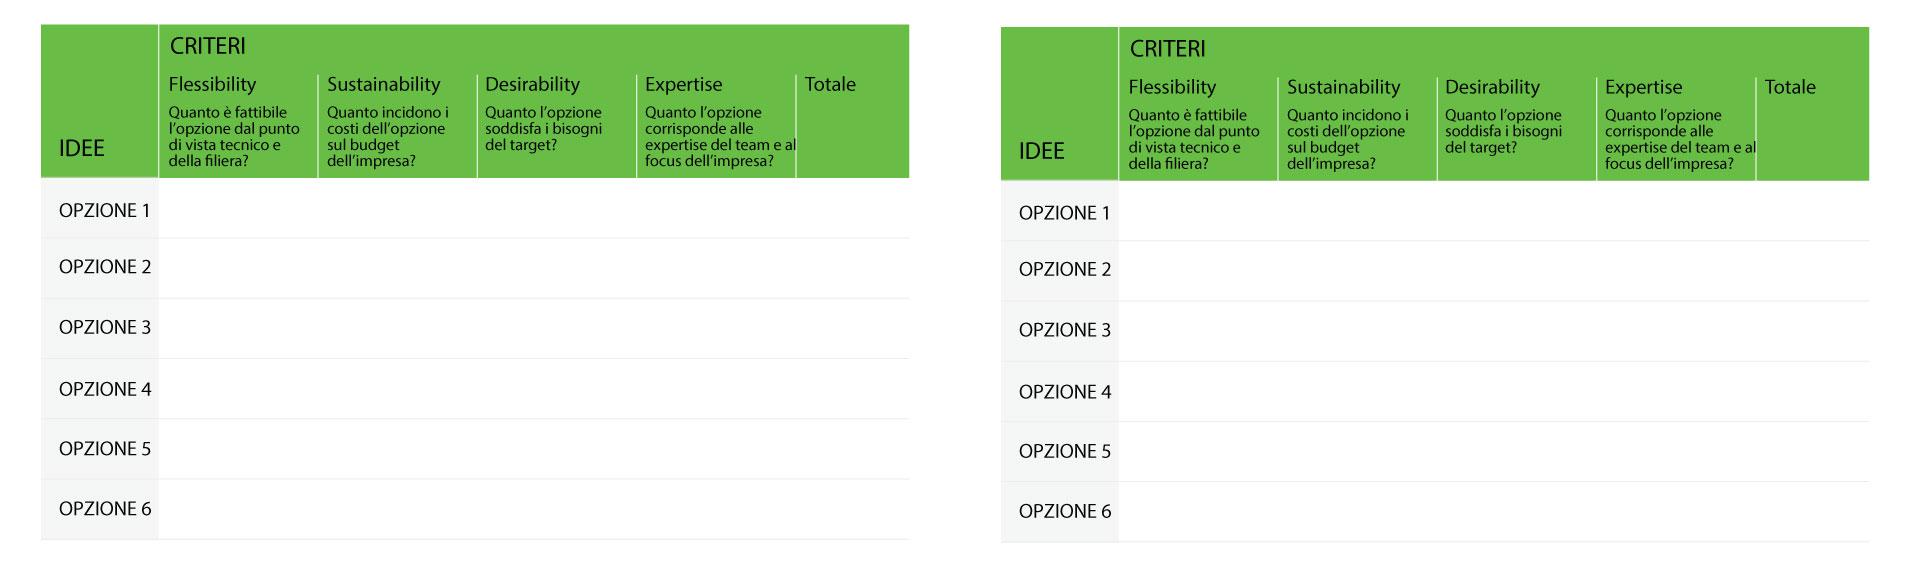 Co-assessment Matrix. Designing choice